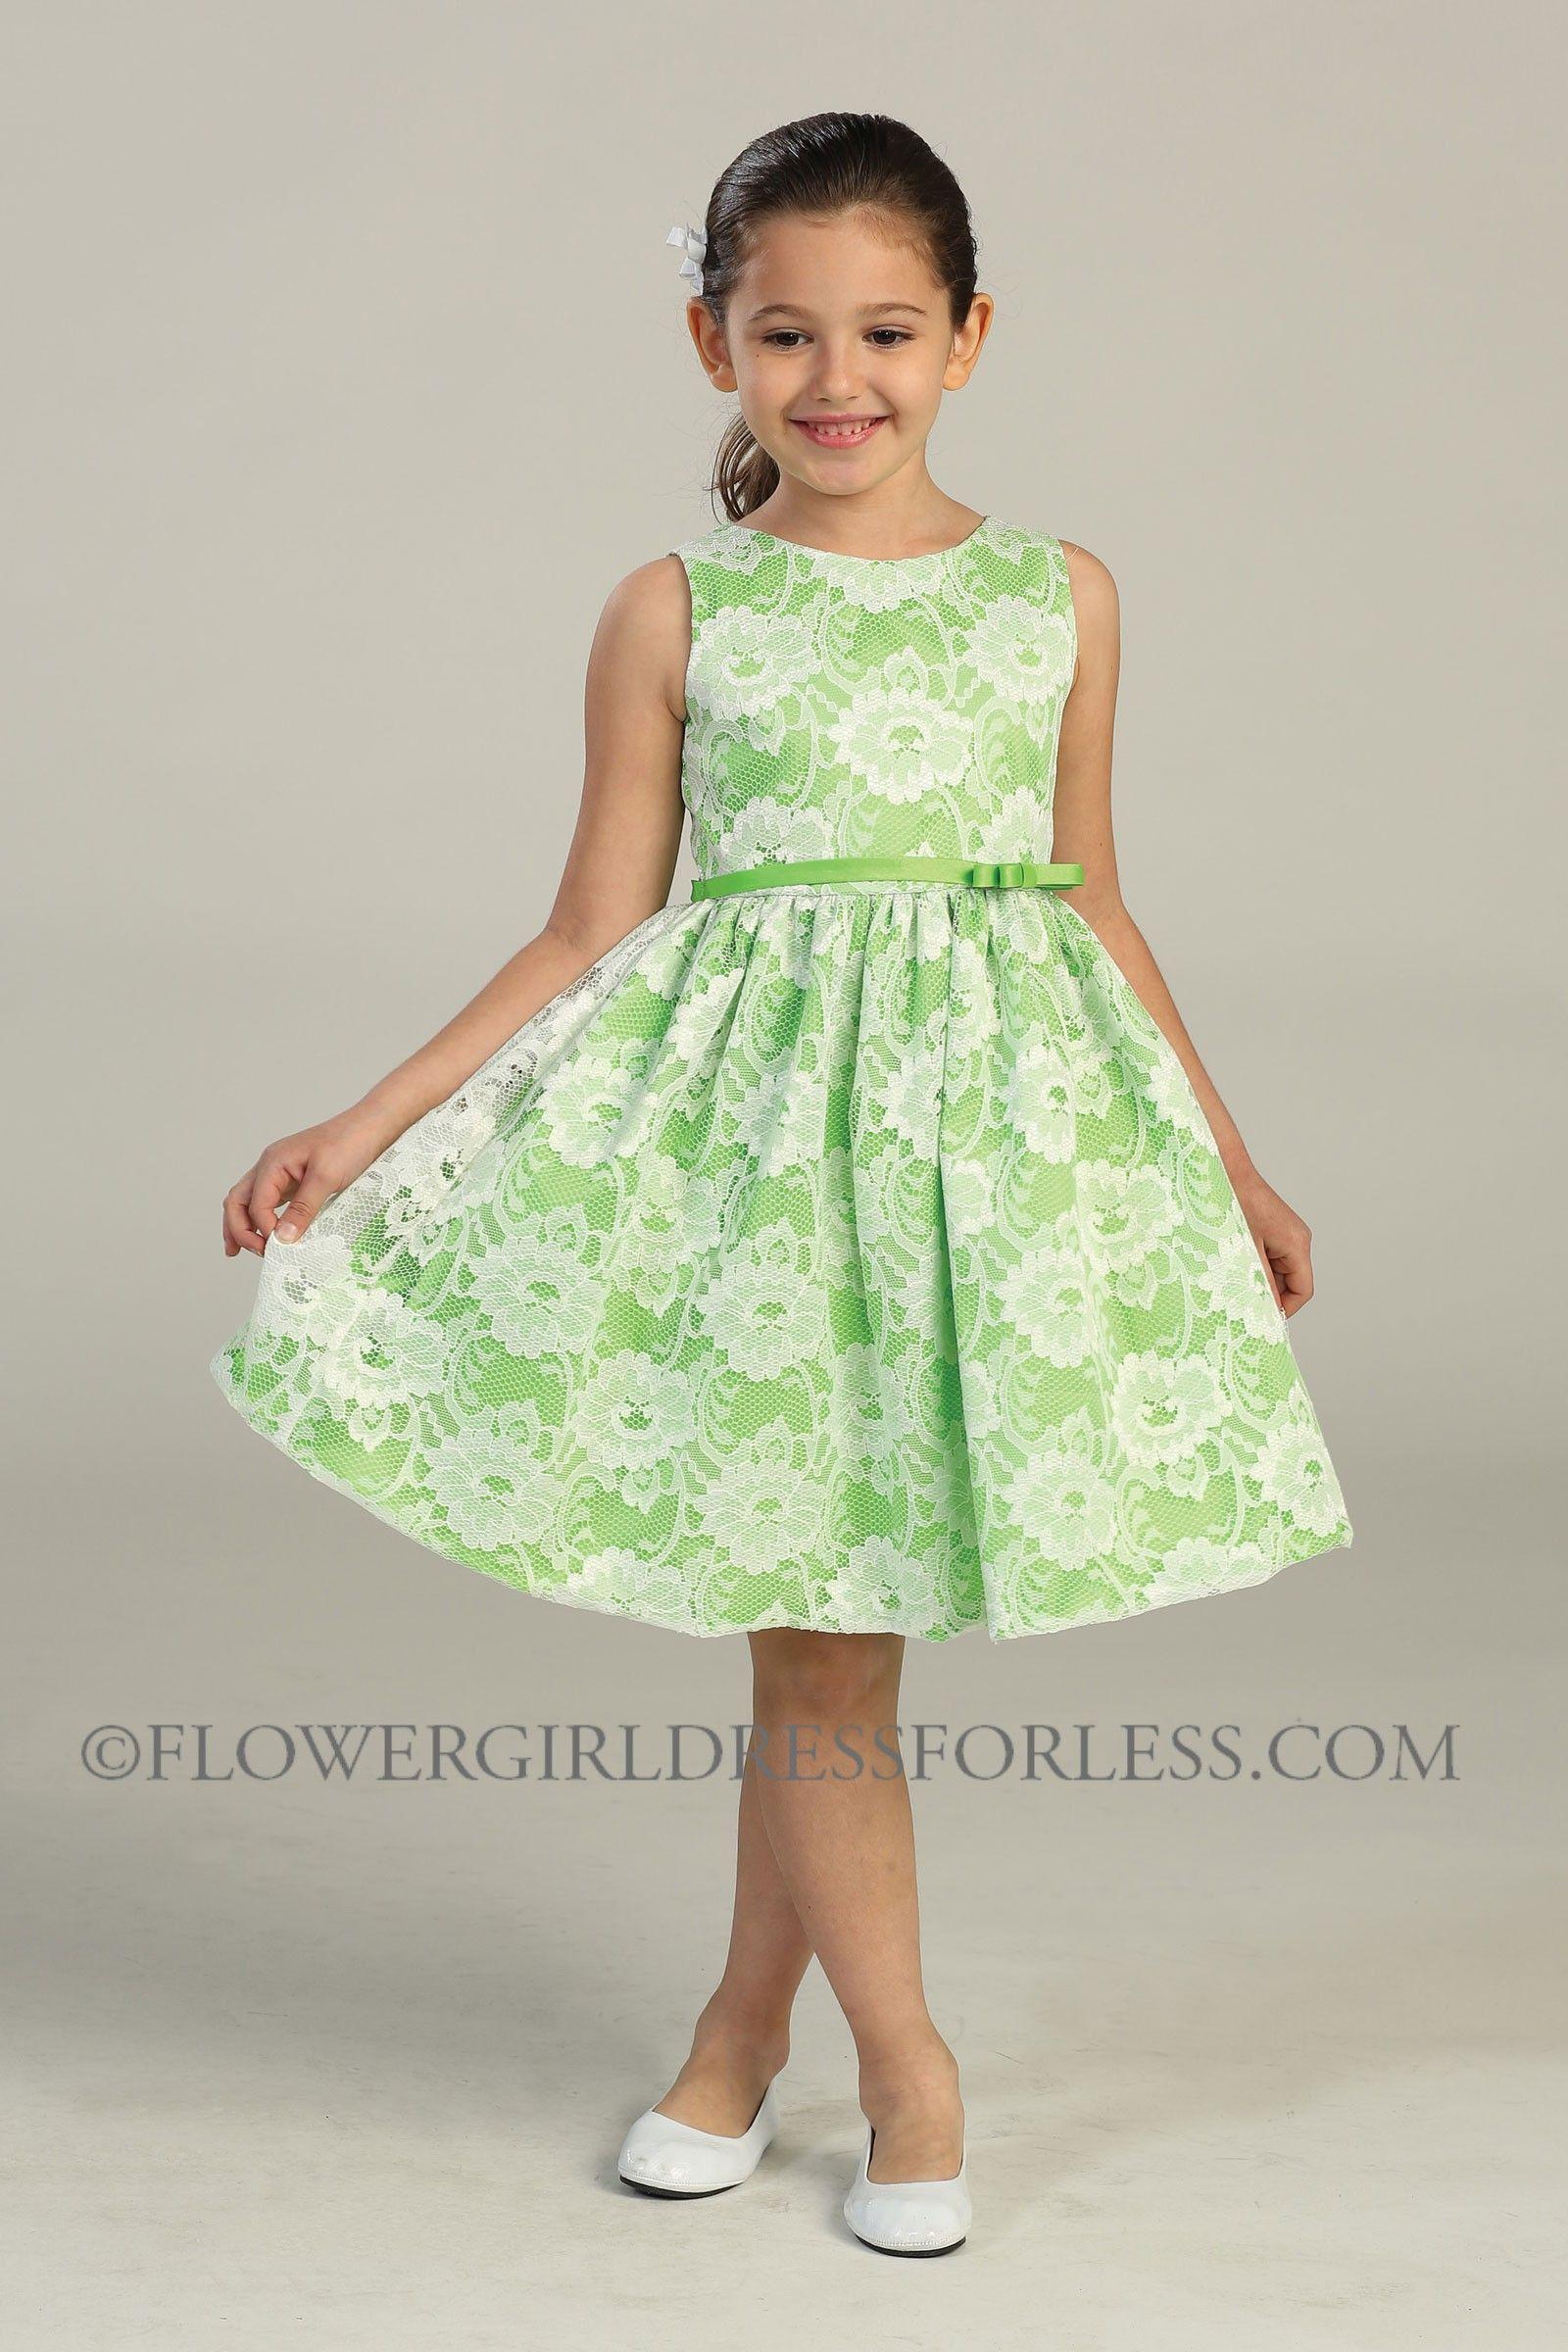 0fa3818f9 SK 436GN - Girls Dress Style 436- Taffeta White Lace Dress - Green ...